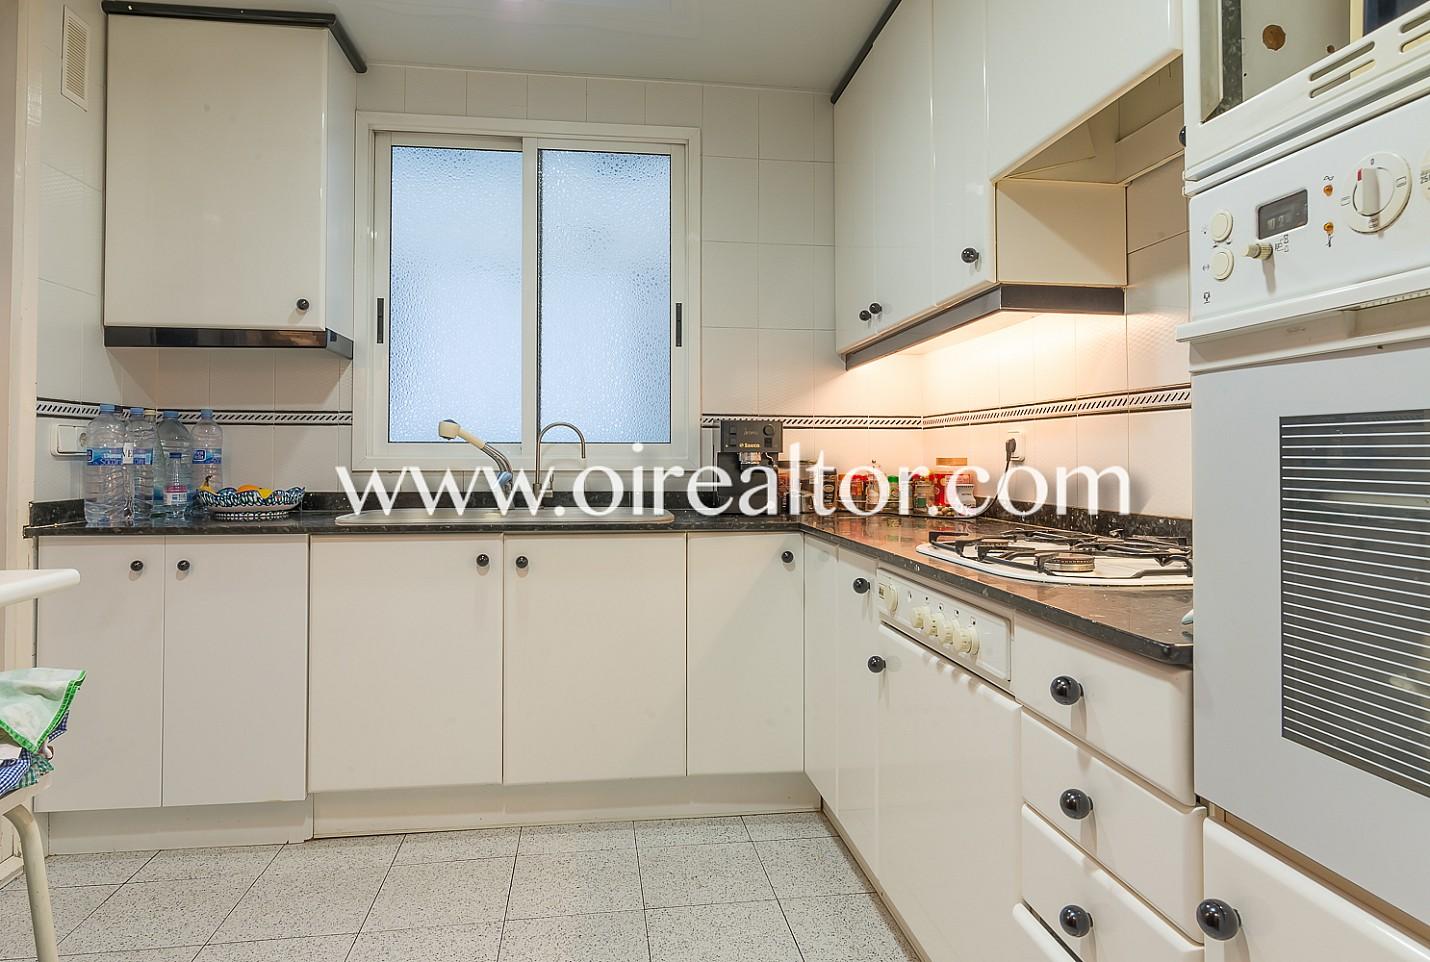 excelente piso en venta con vistas a sagrada familia barcelona oi realtor. Black Bedroom Furniture Sets. Home Design Ideas